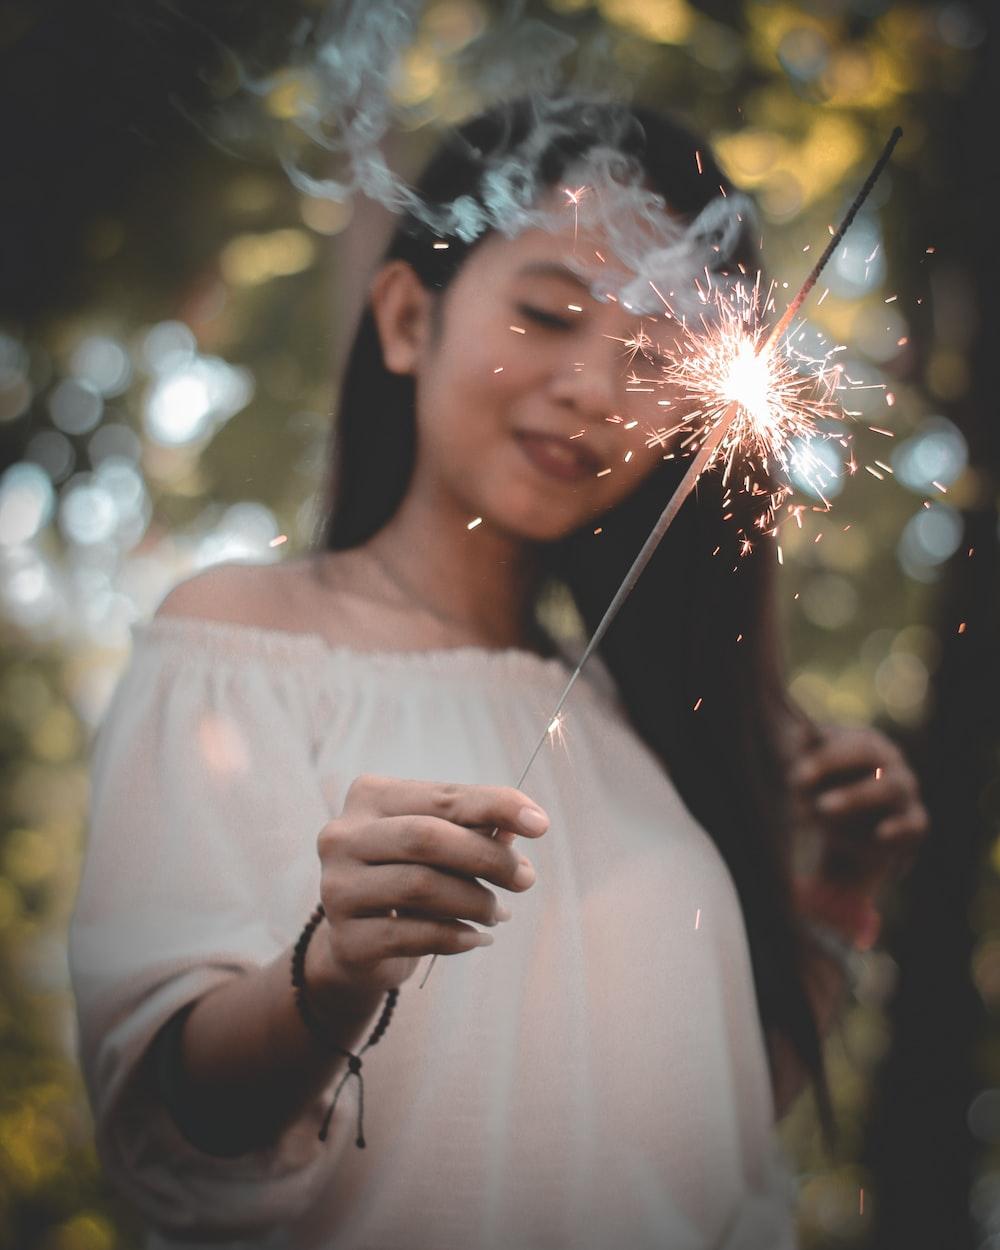 woman wearing white off-shoulder top holding sparkler